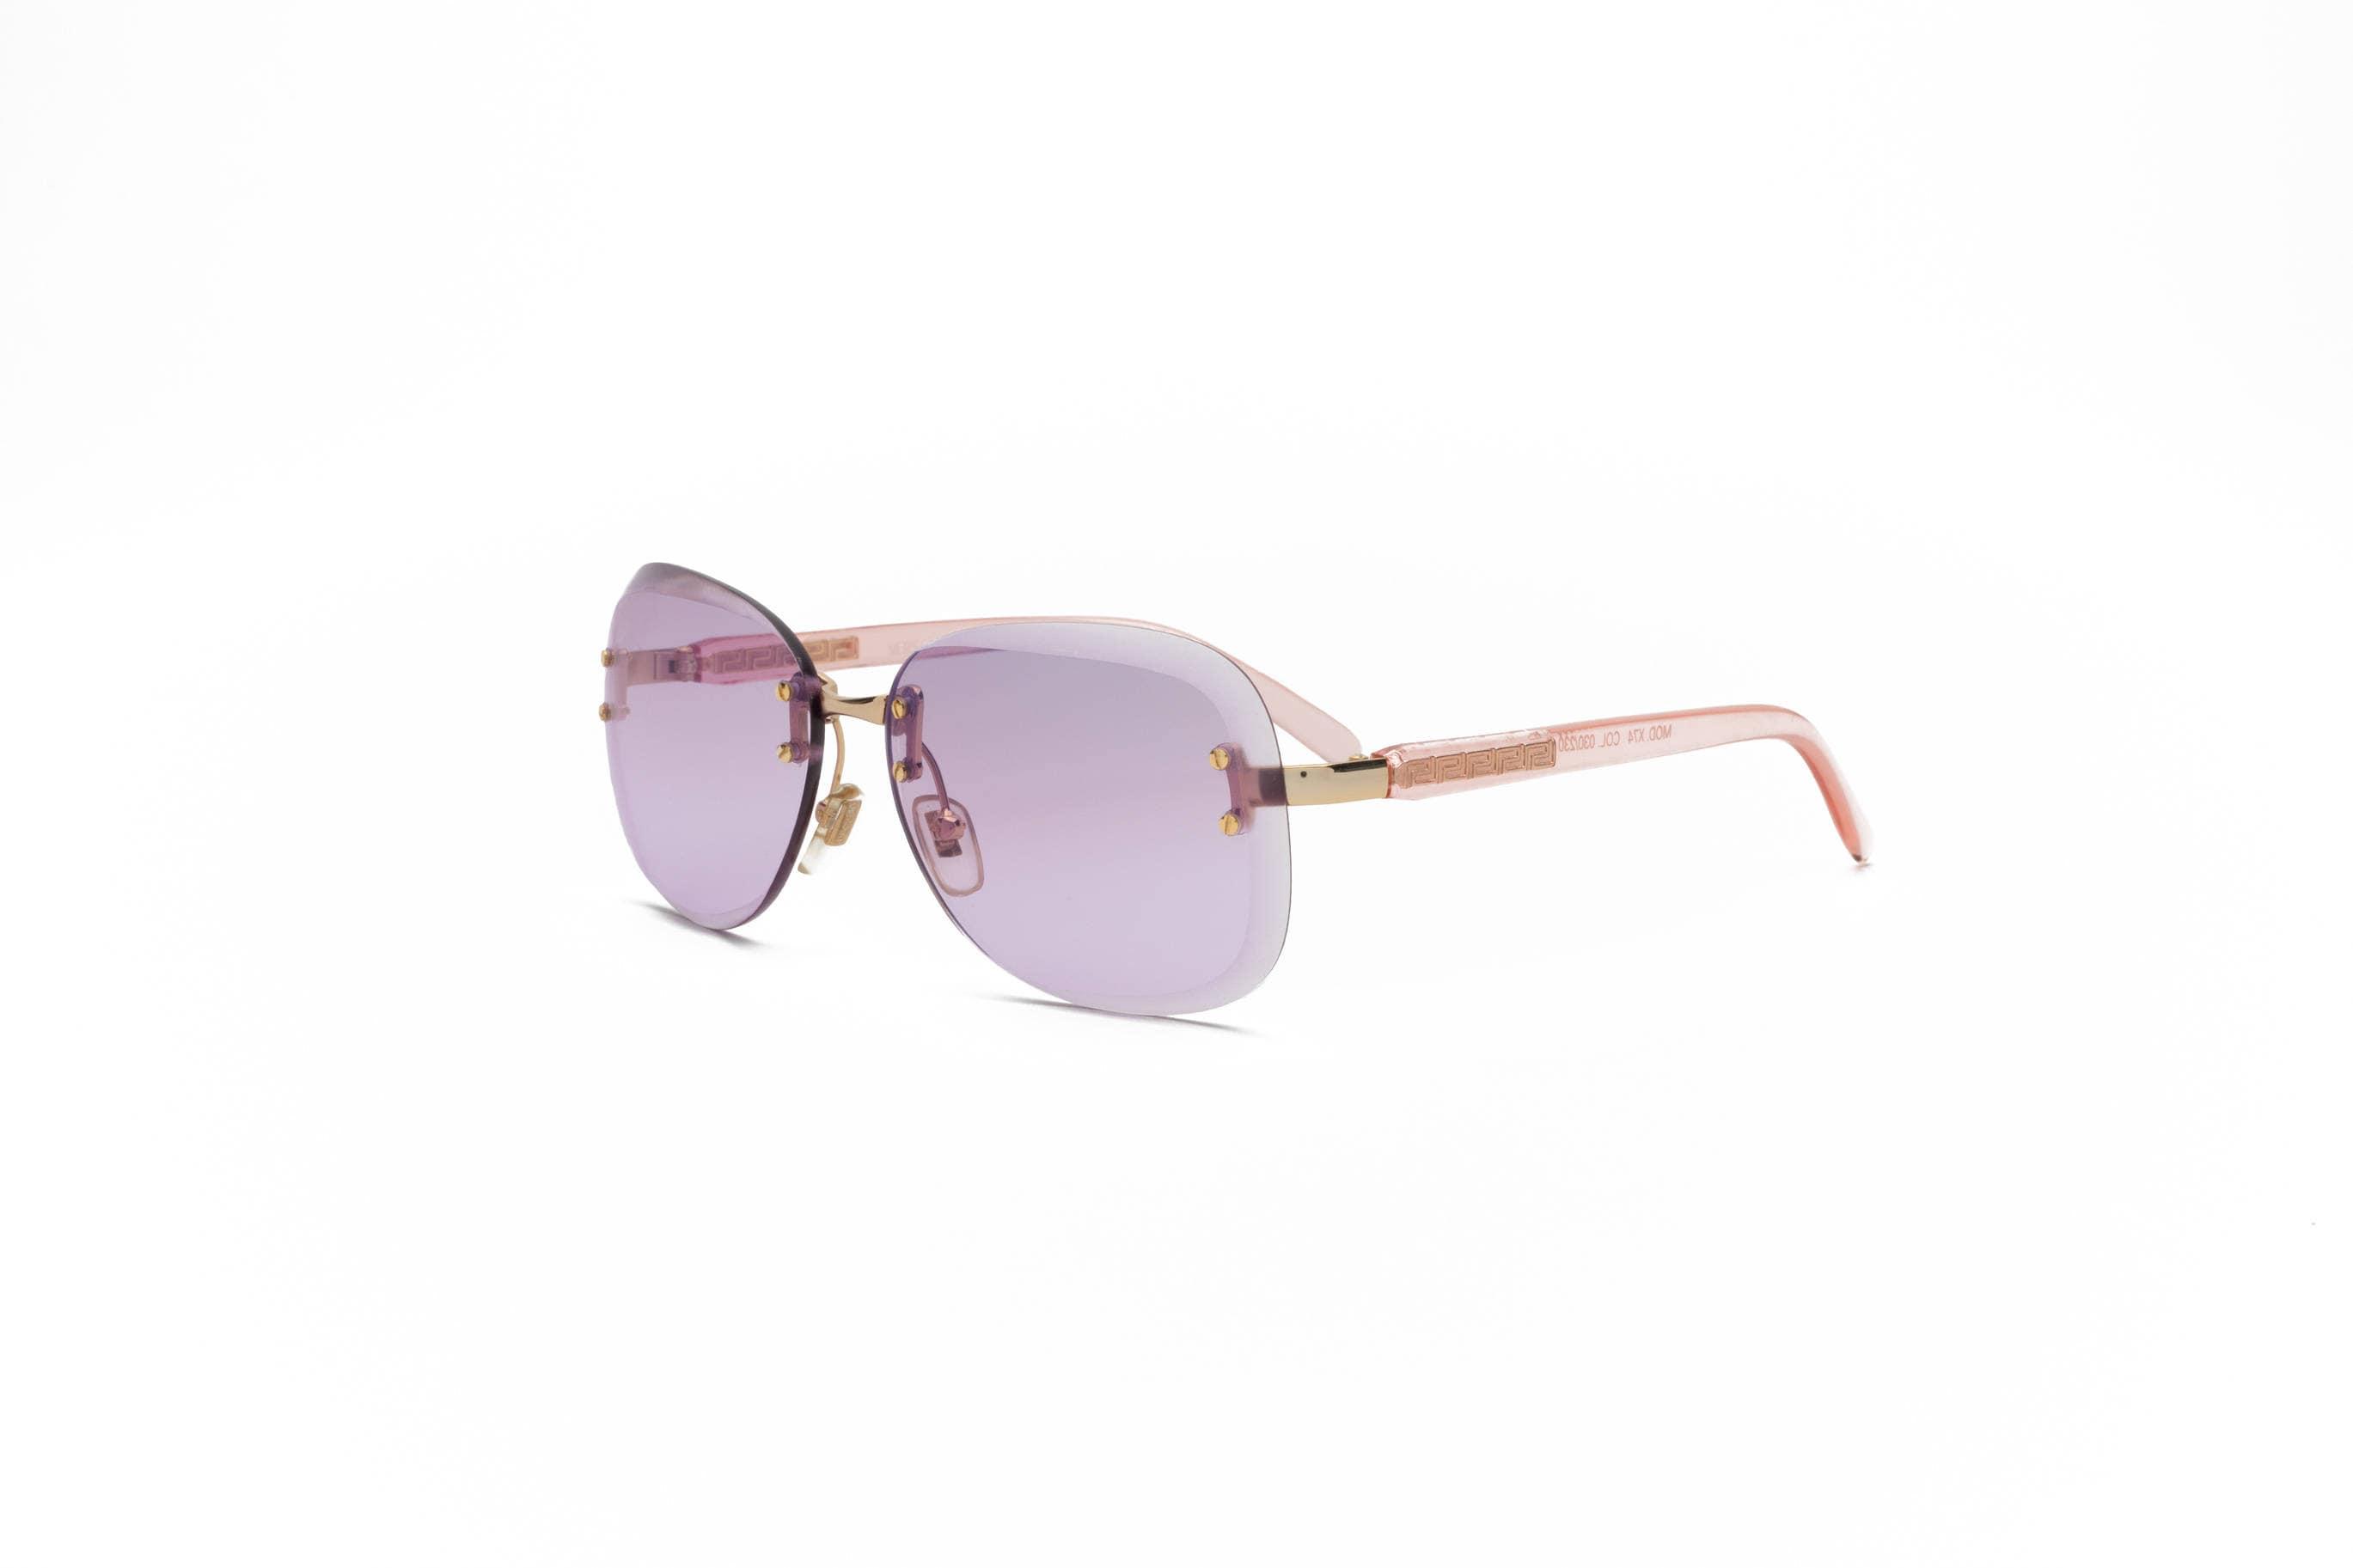 Lila Sonnenbrille Modell X74 030/230 Jahrgang Gianni Versace